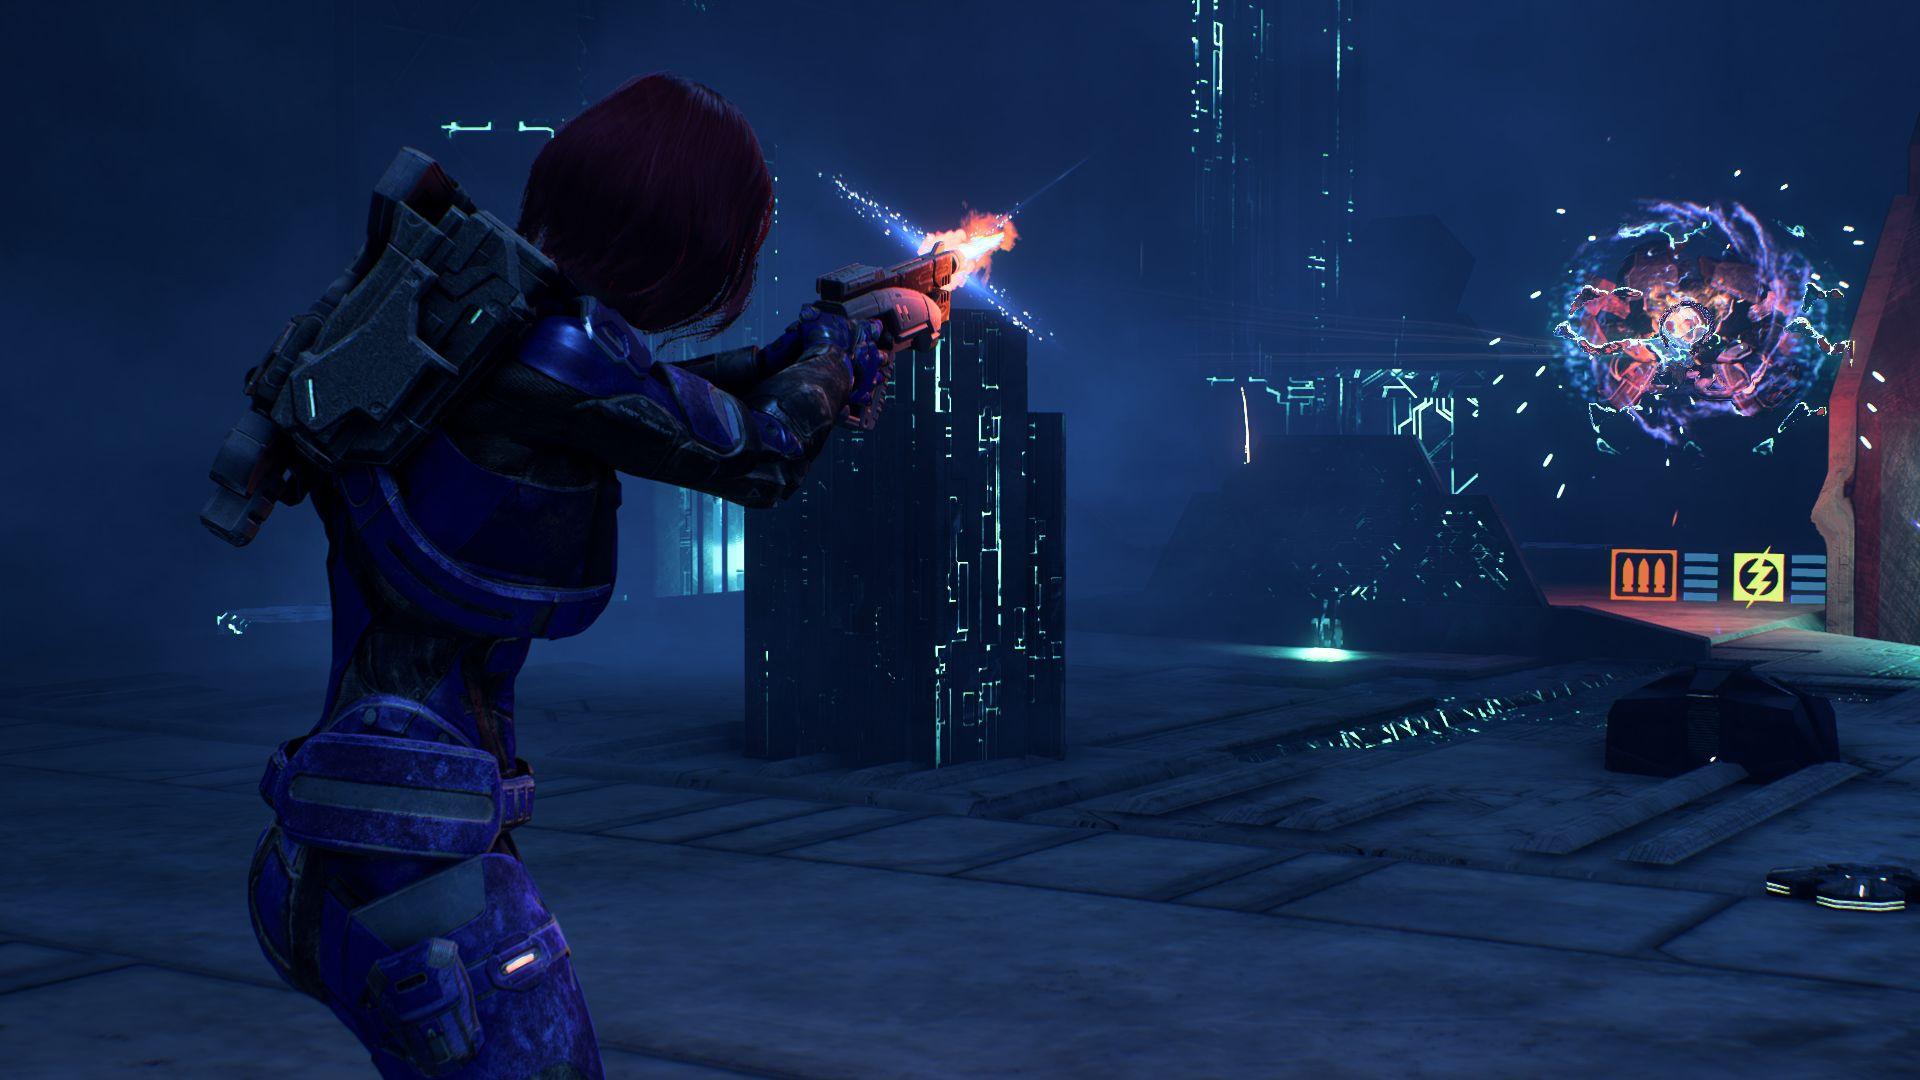 Mass Effect Andromeda Screenshot 2017.07.27 - 19.43.23.67.jpg - Mass Effect: Andromeda